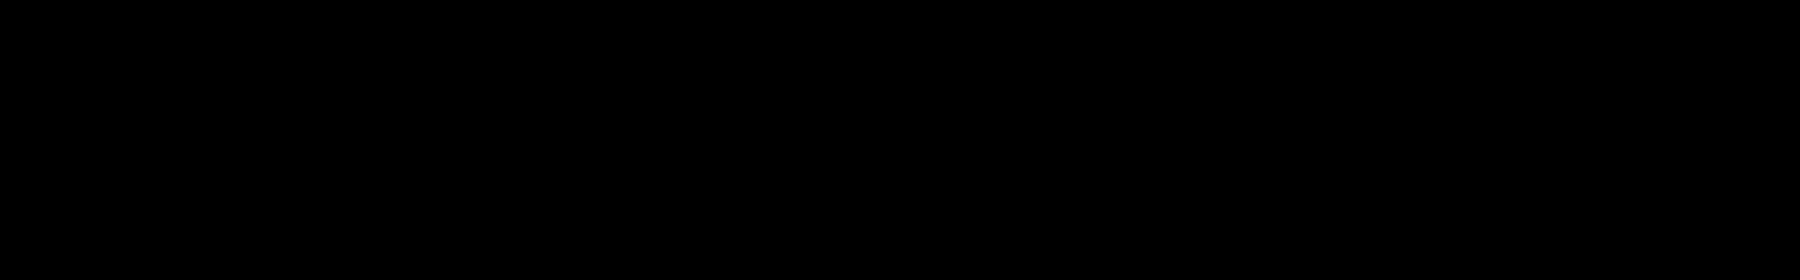 Tunecraft Ambient Cinematic Pads Vol.2 audio waveform